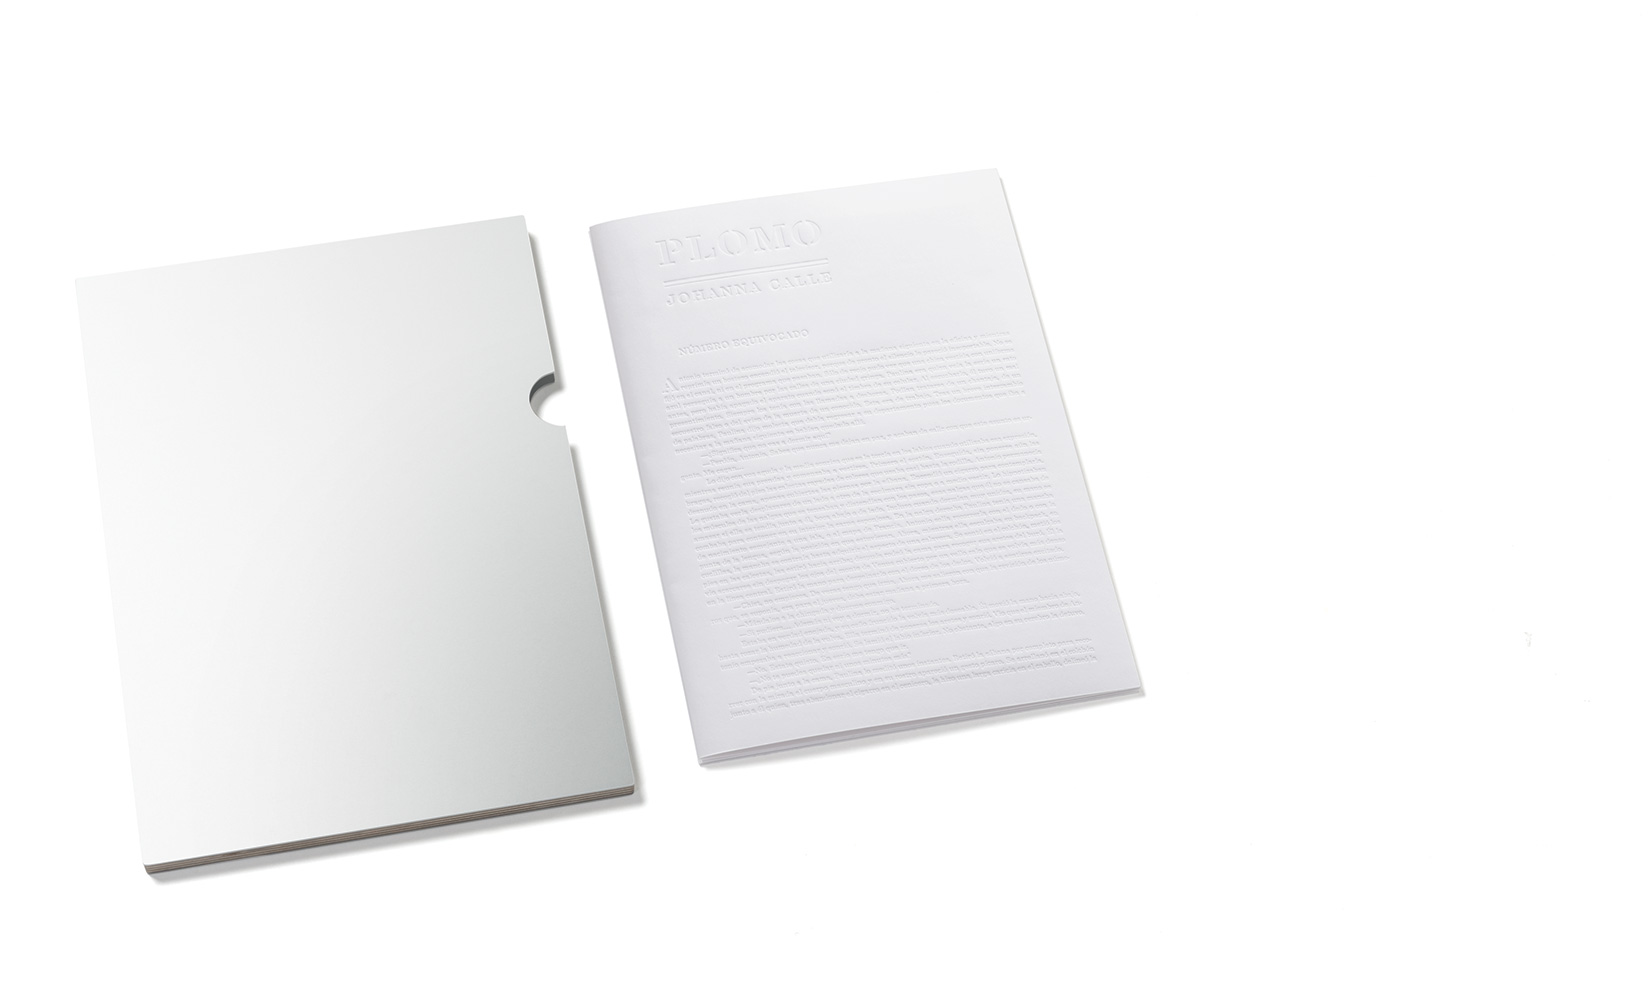 johanna-calle-olivier-andreotti-toluca-editions-02.jpg